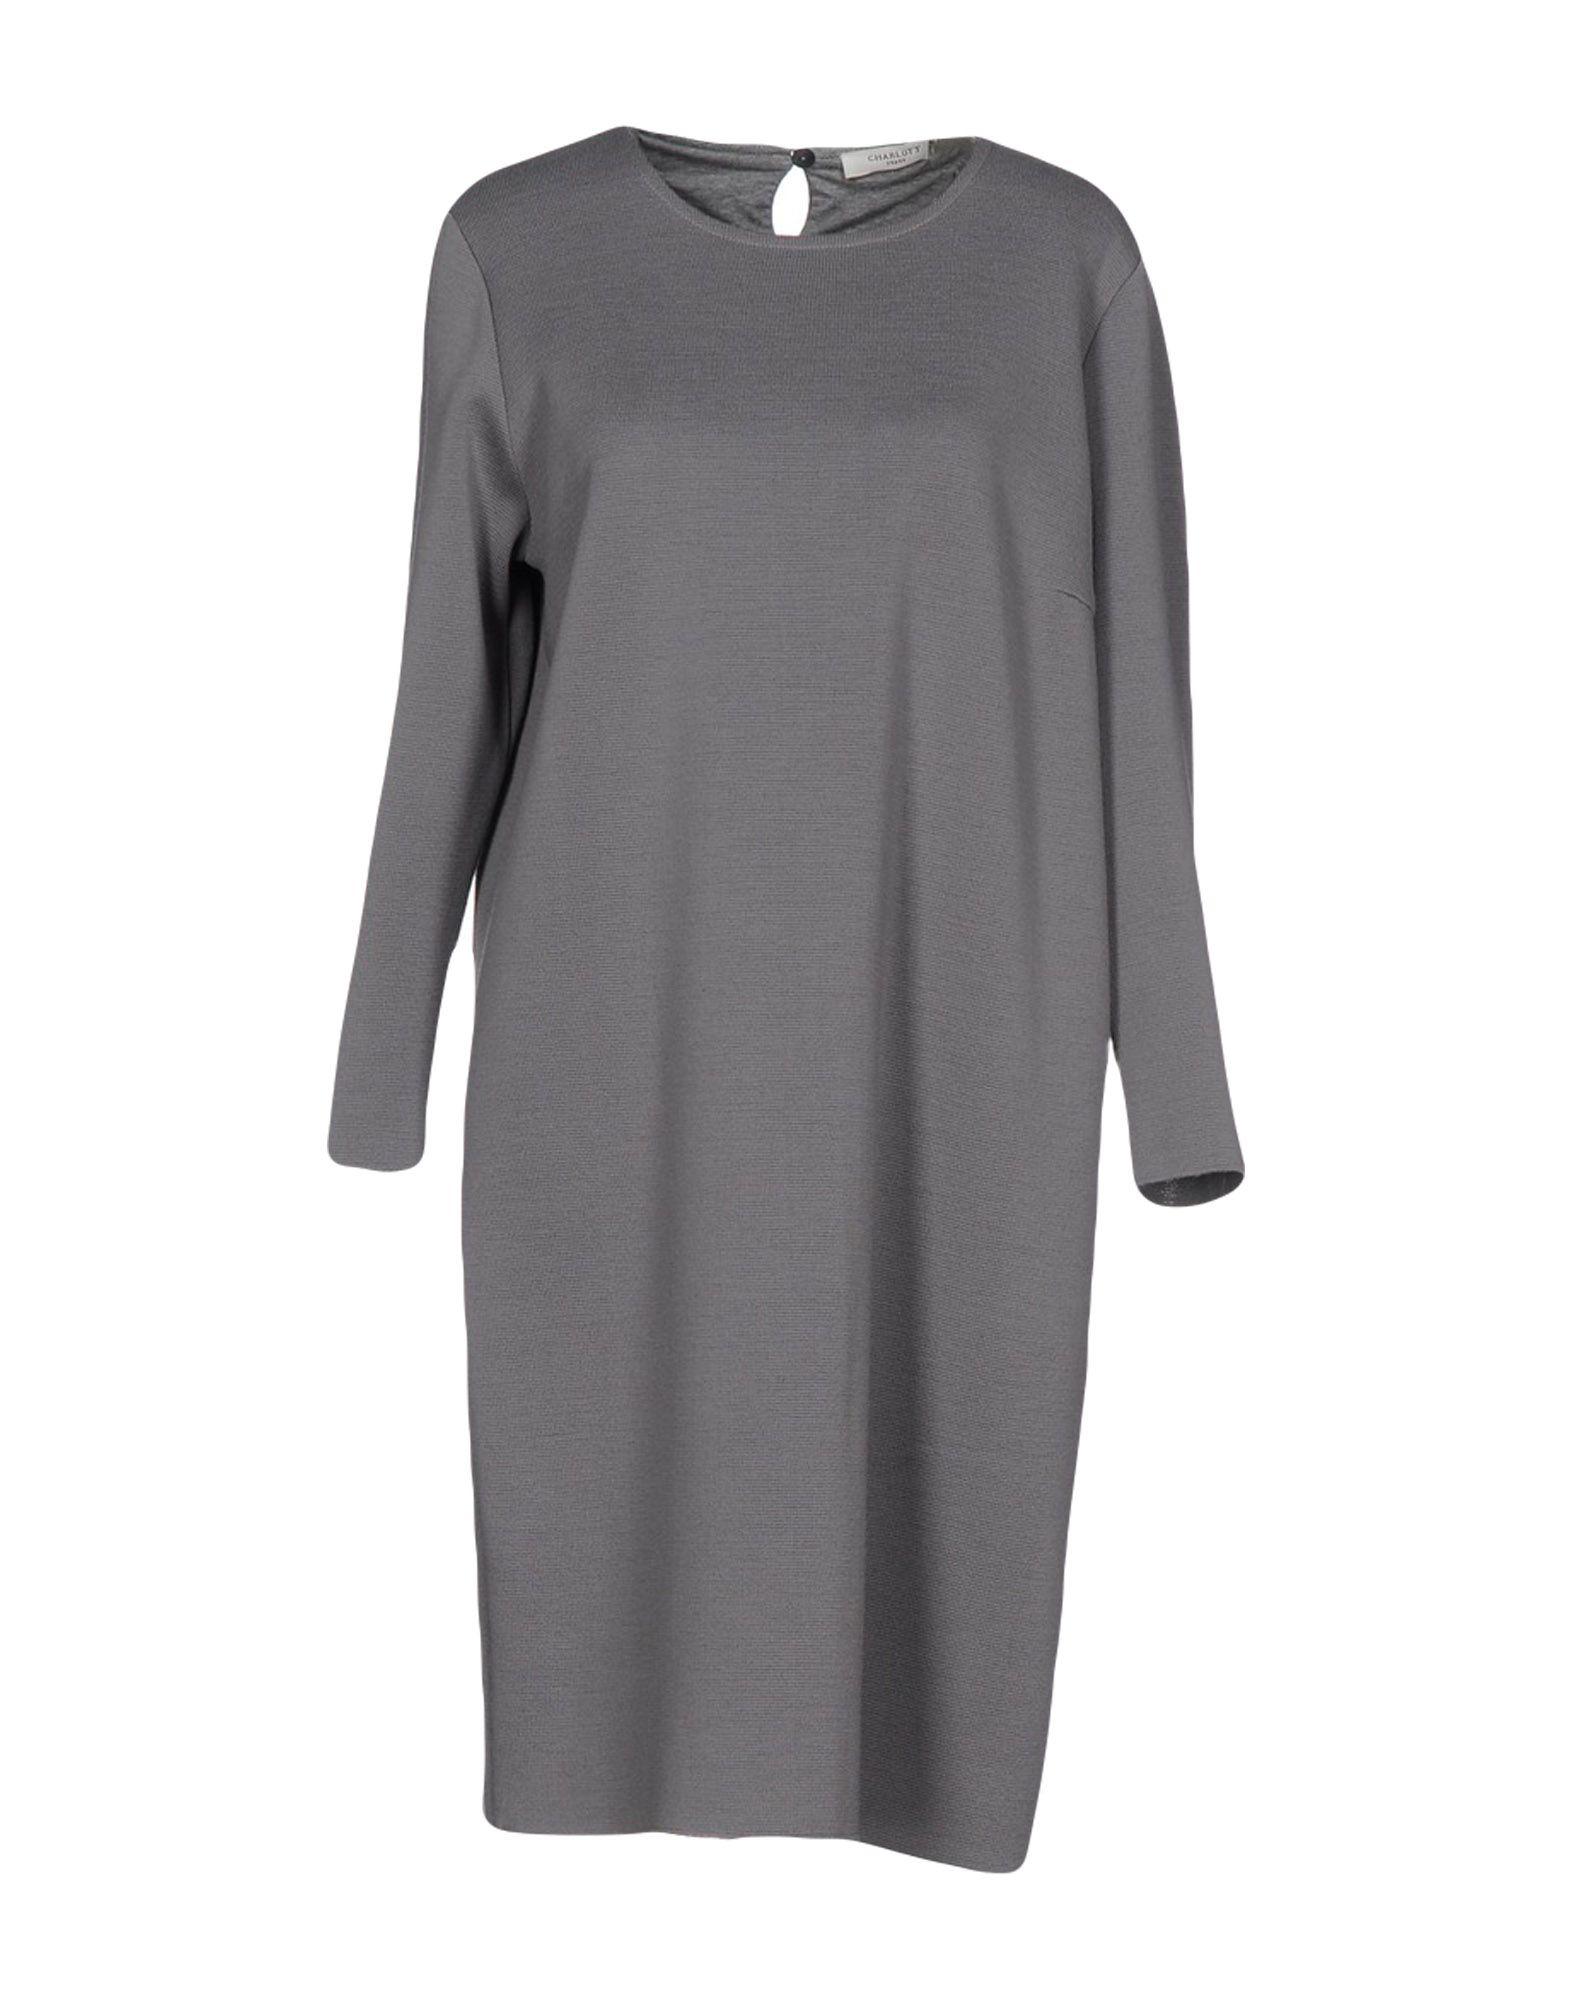 charlott платье 861 10 синий CHARLOTT Платье до колена